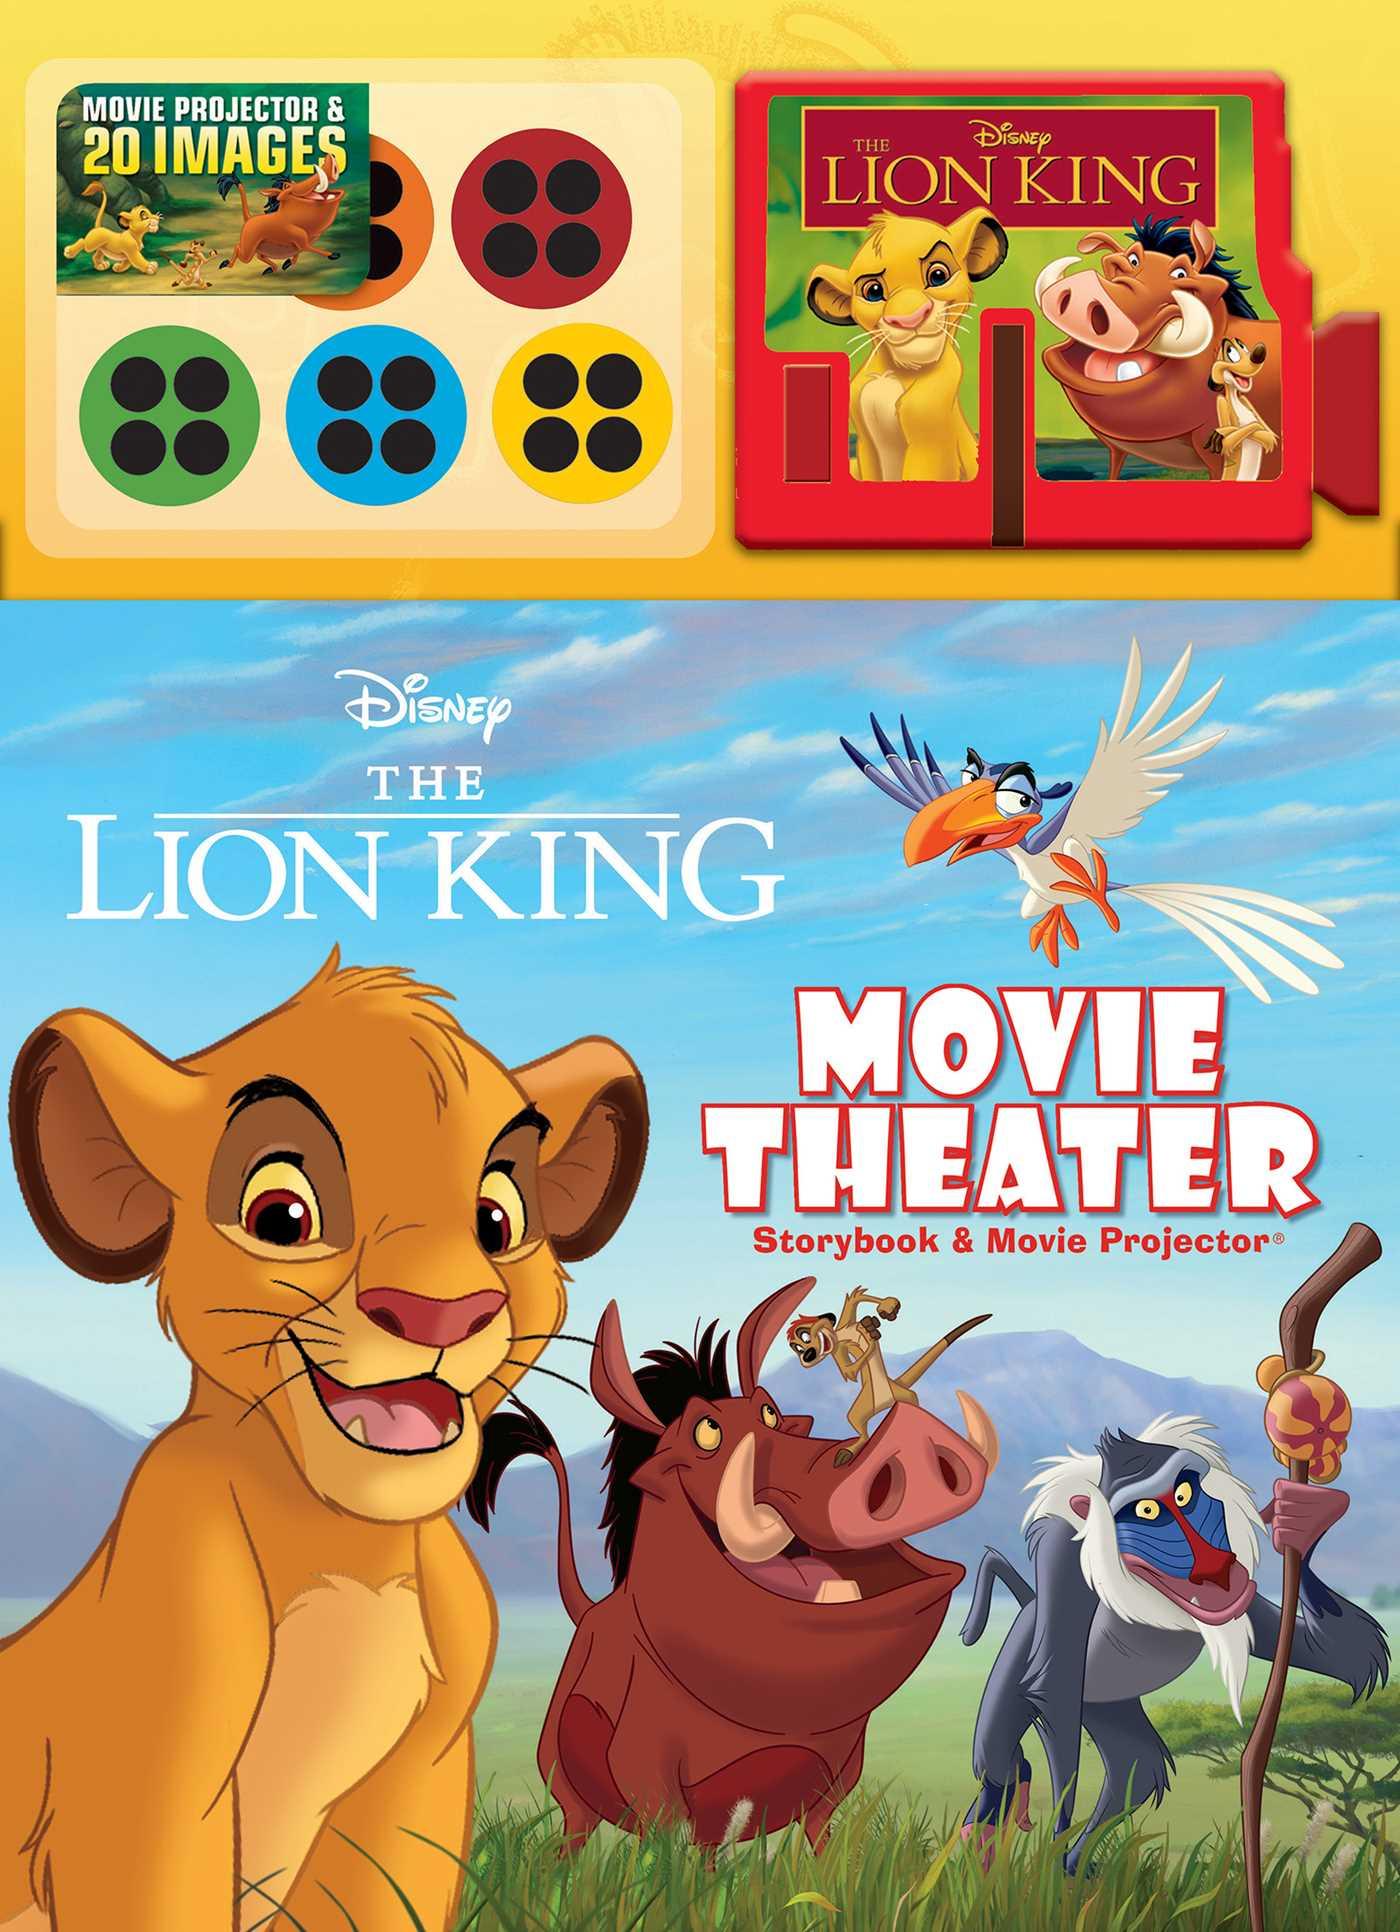 Disney The Lion King Movie Theater Storybook & Movie ...